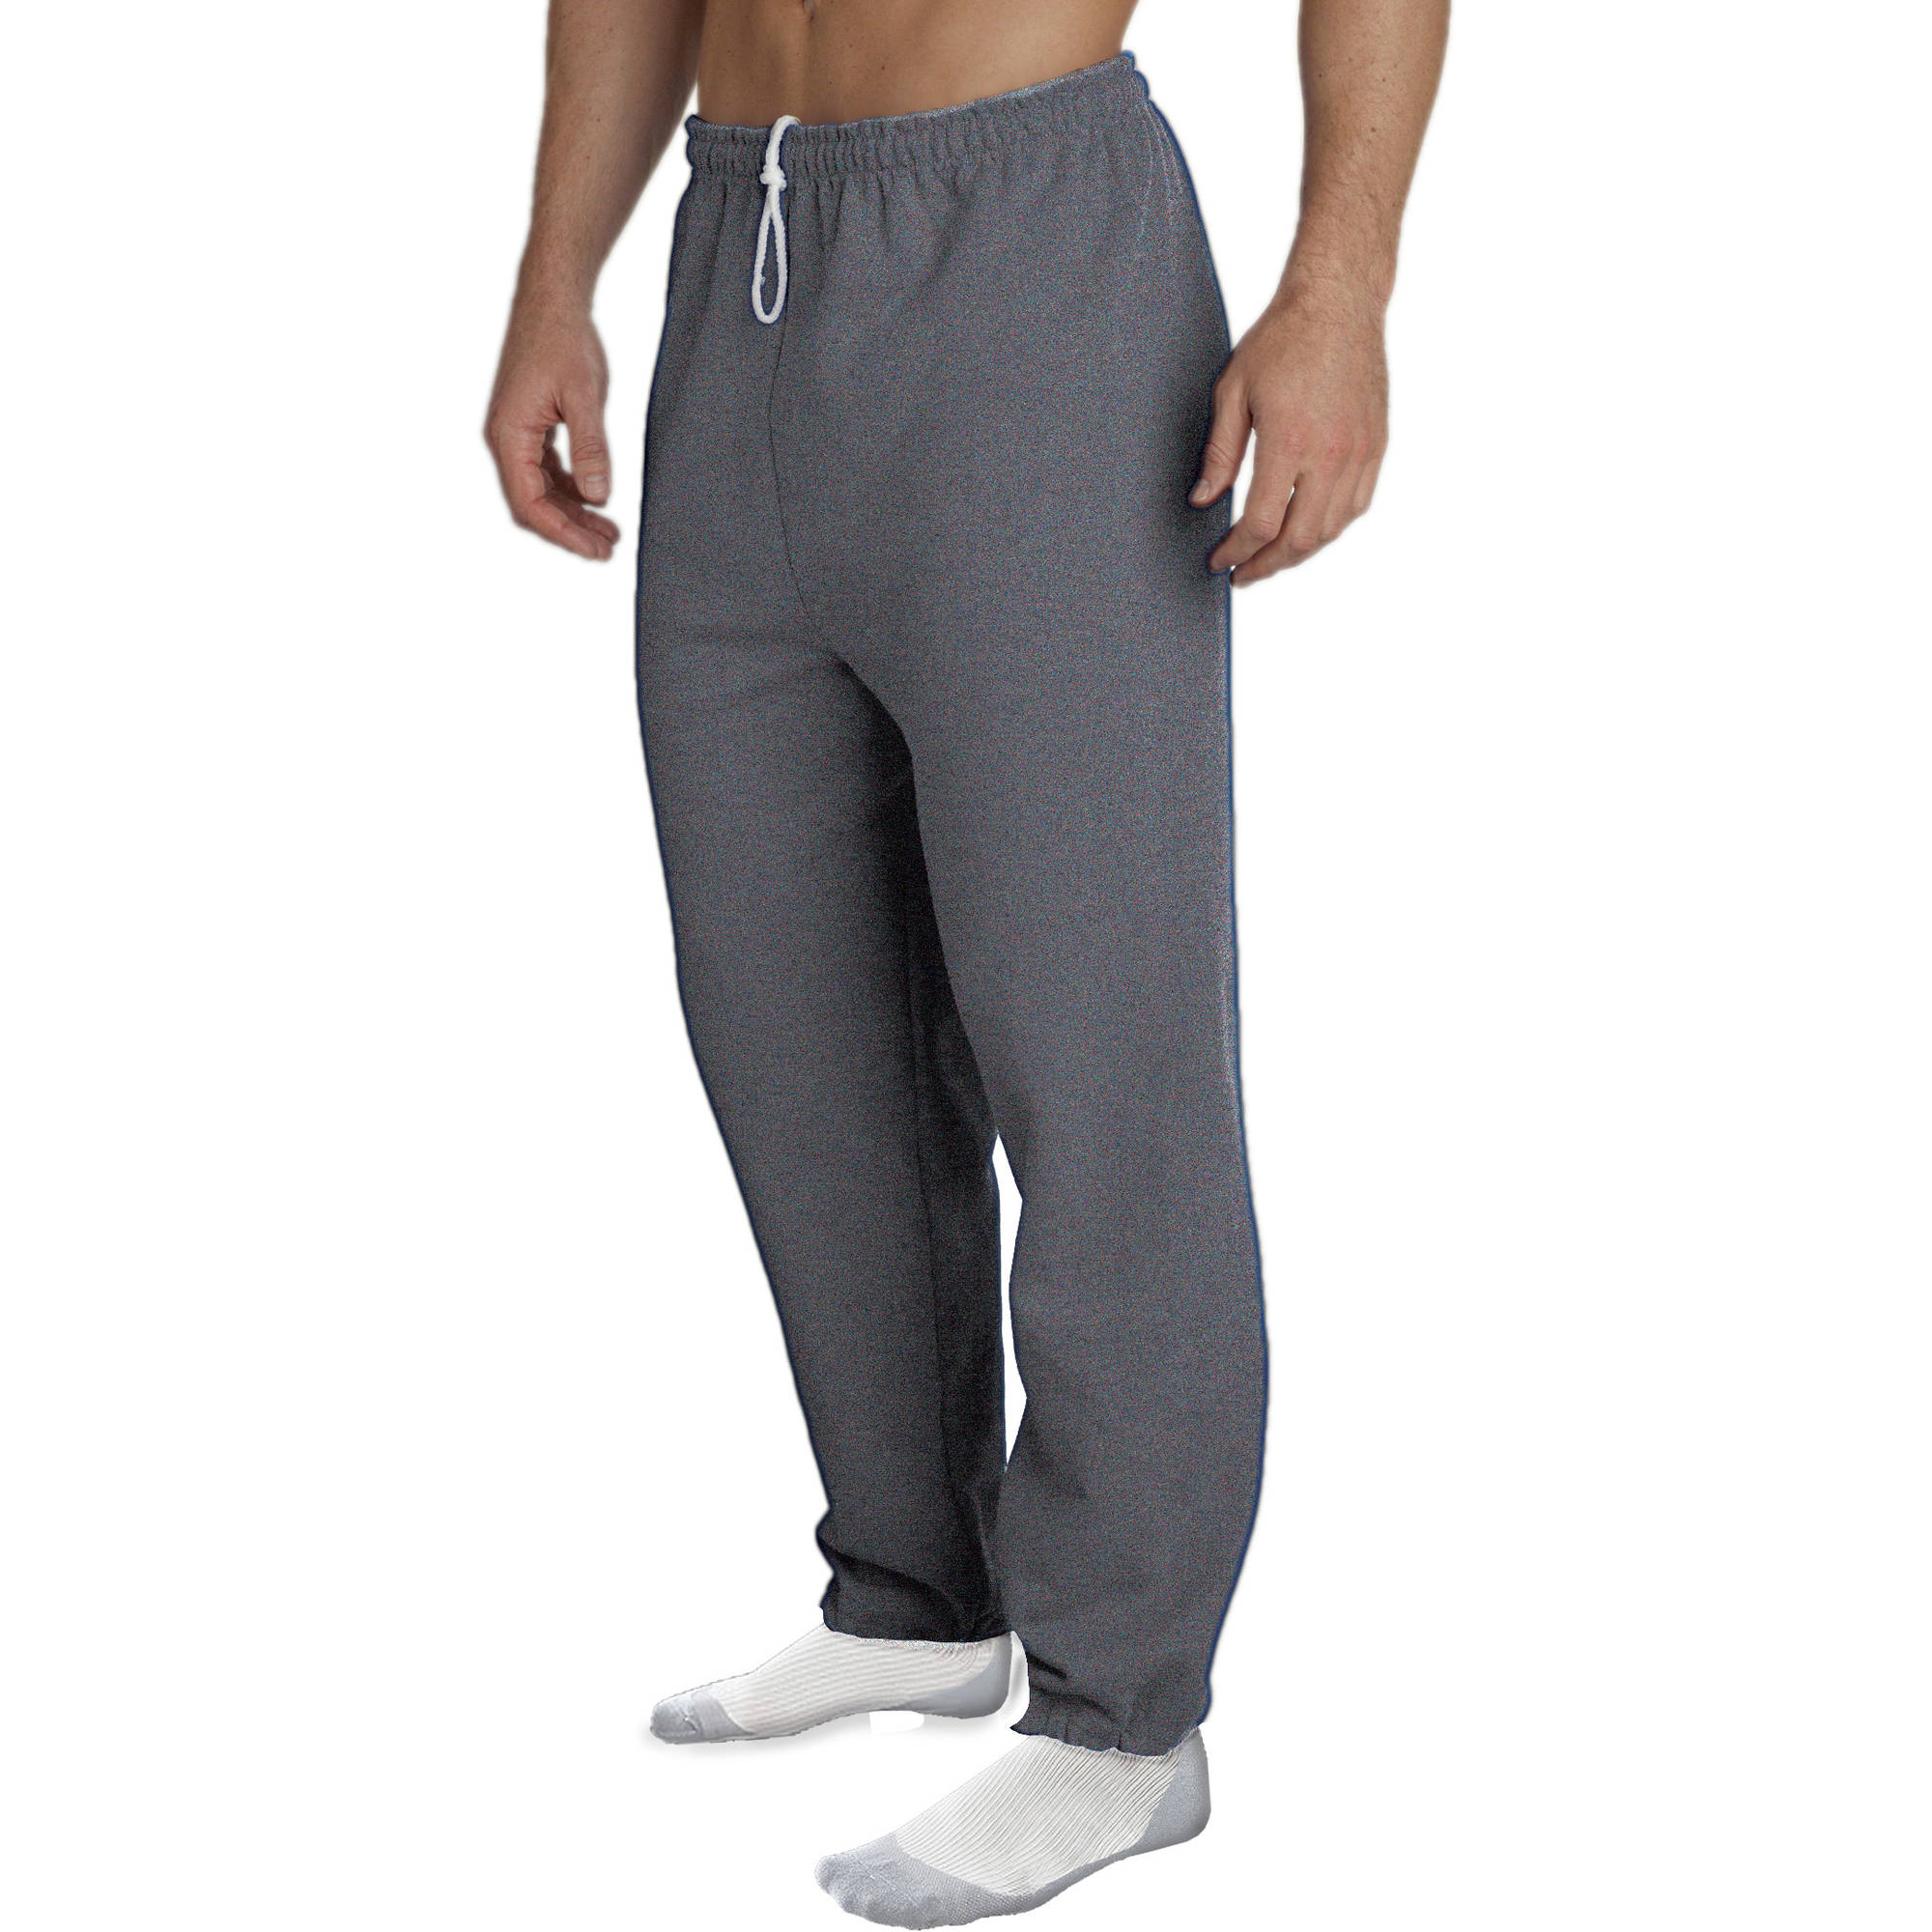 Gildan Men's Elastic Bottom Pocketed Sweatpant